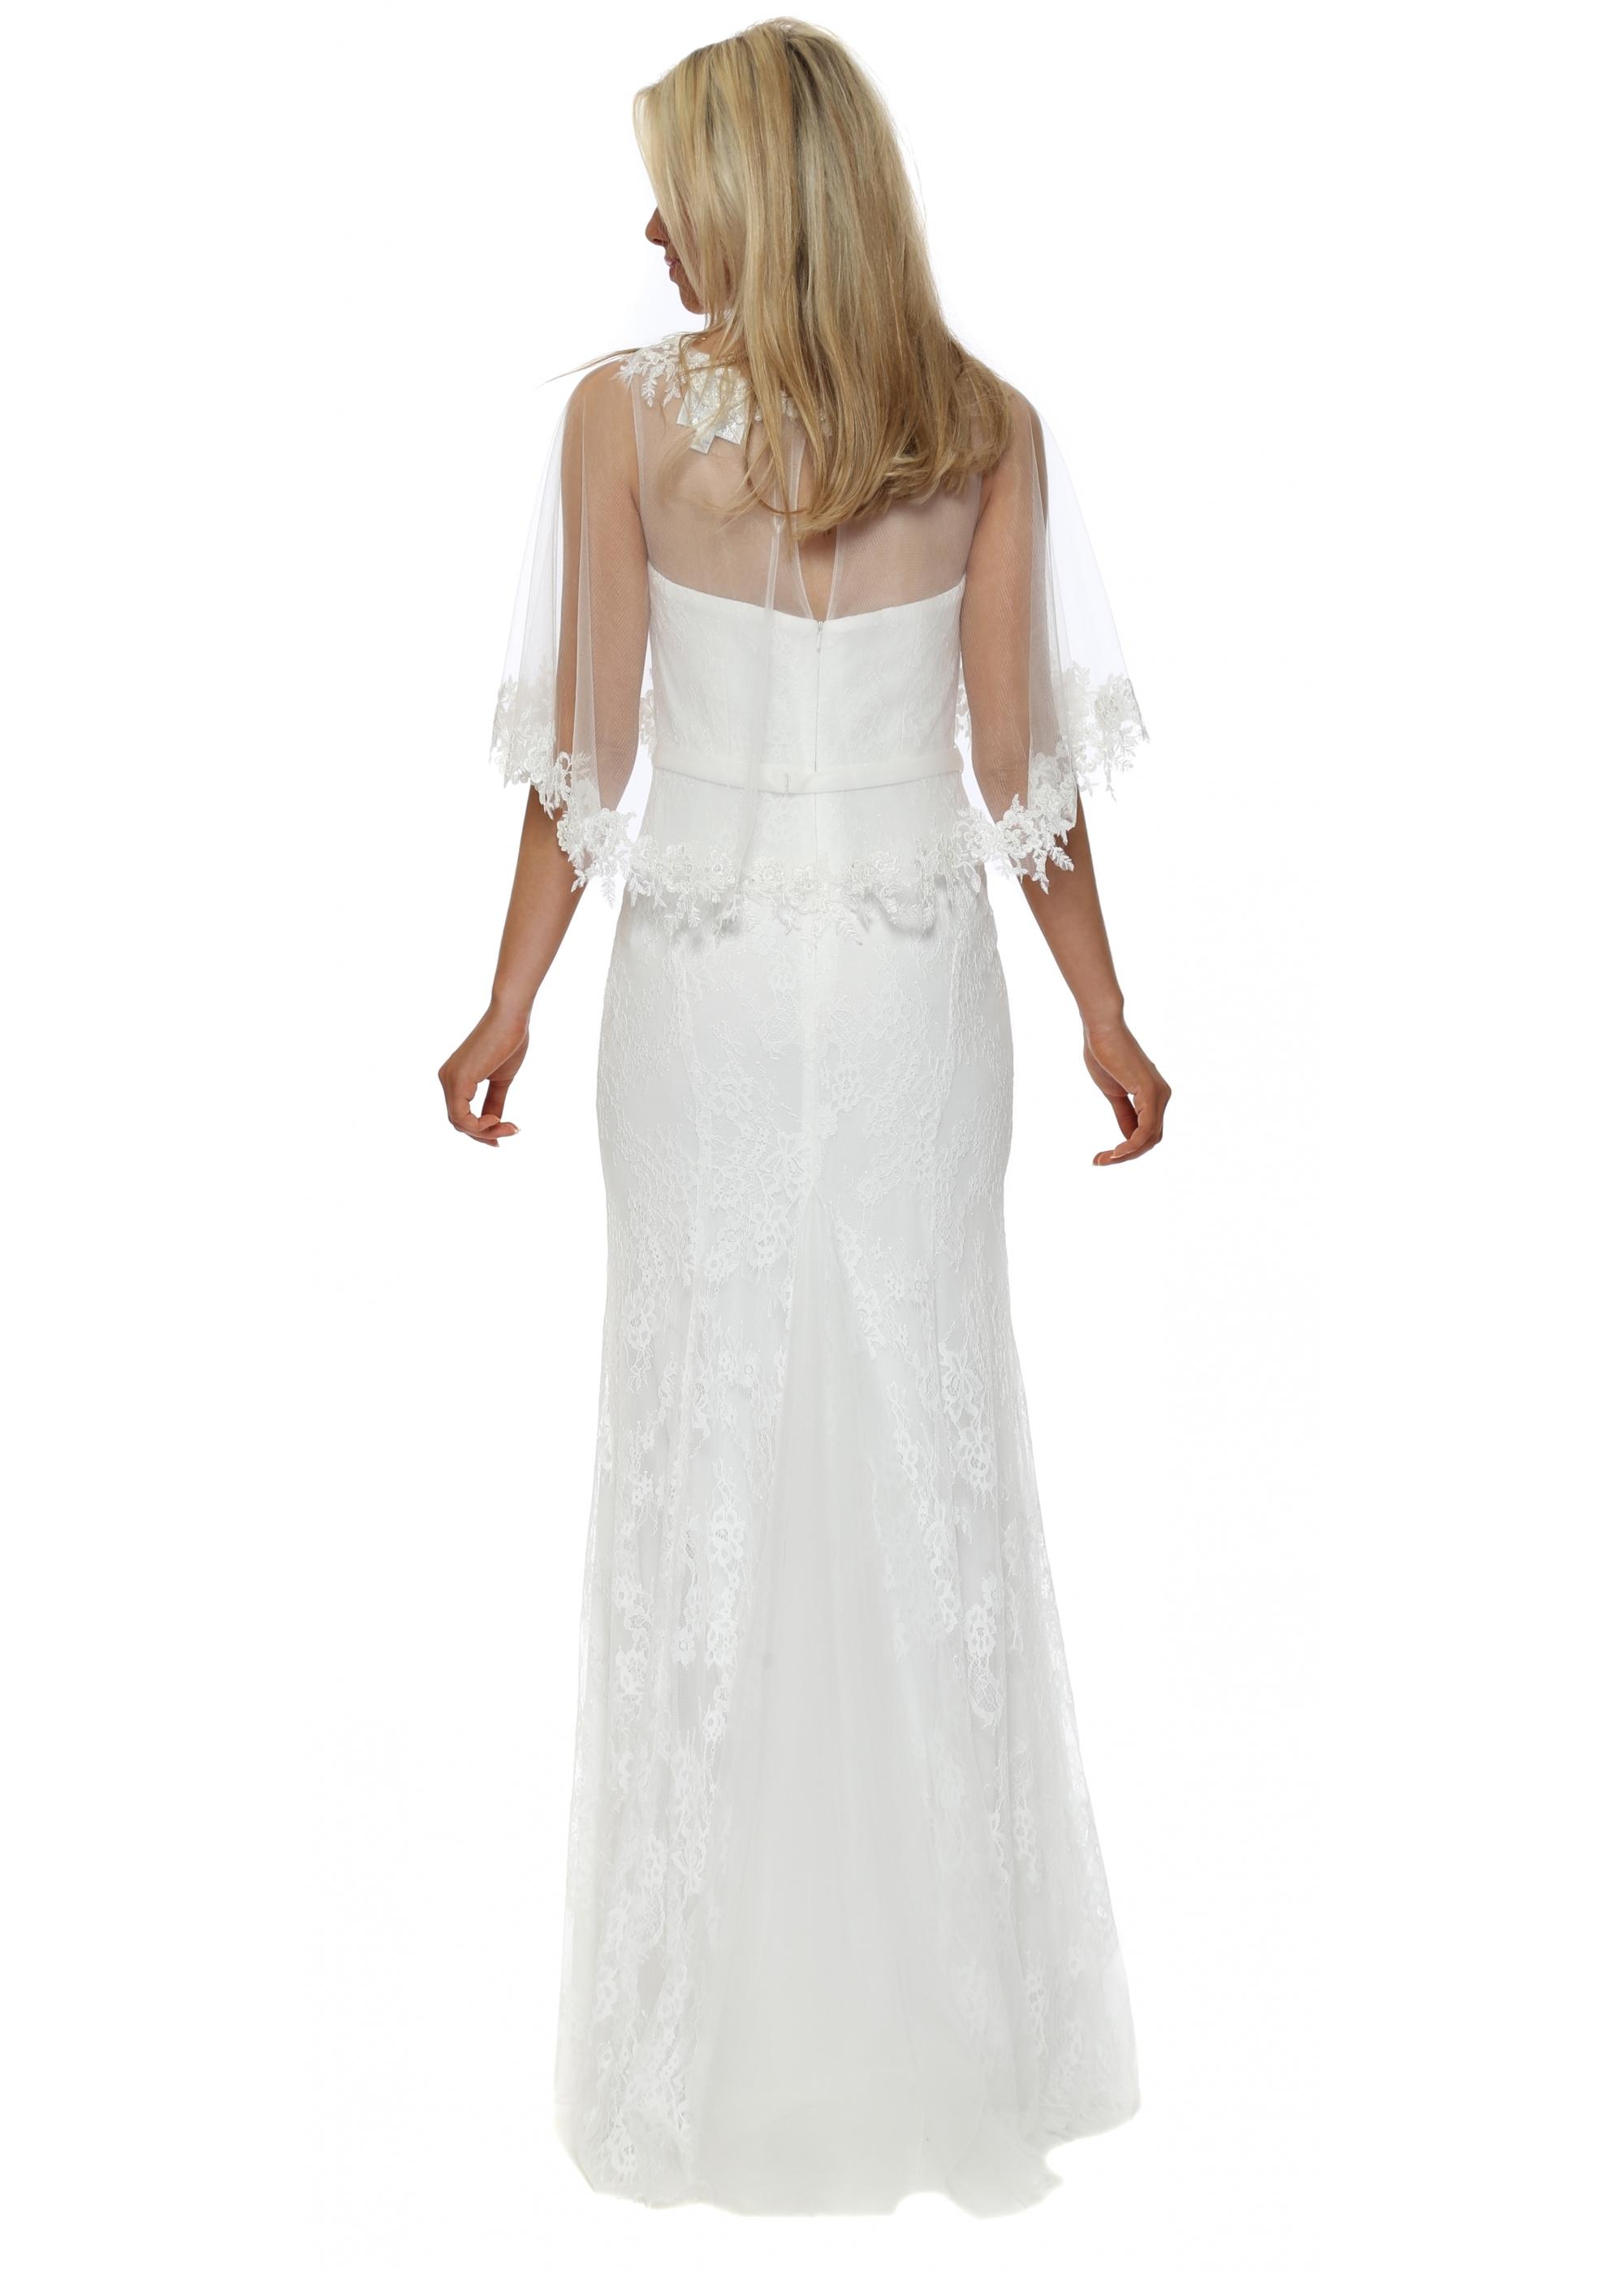 Mascara White Lace Cape Gown - Style MC181166